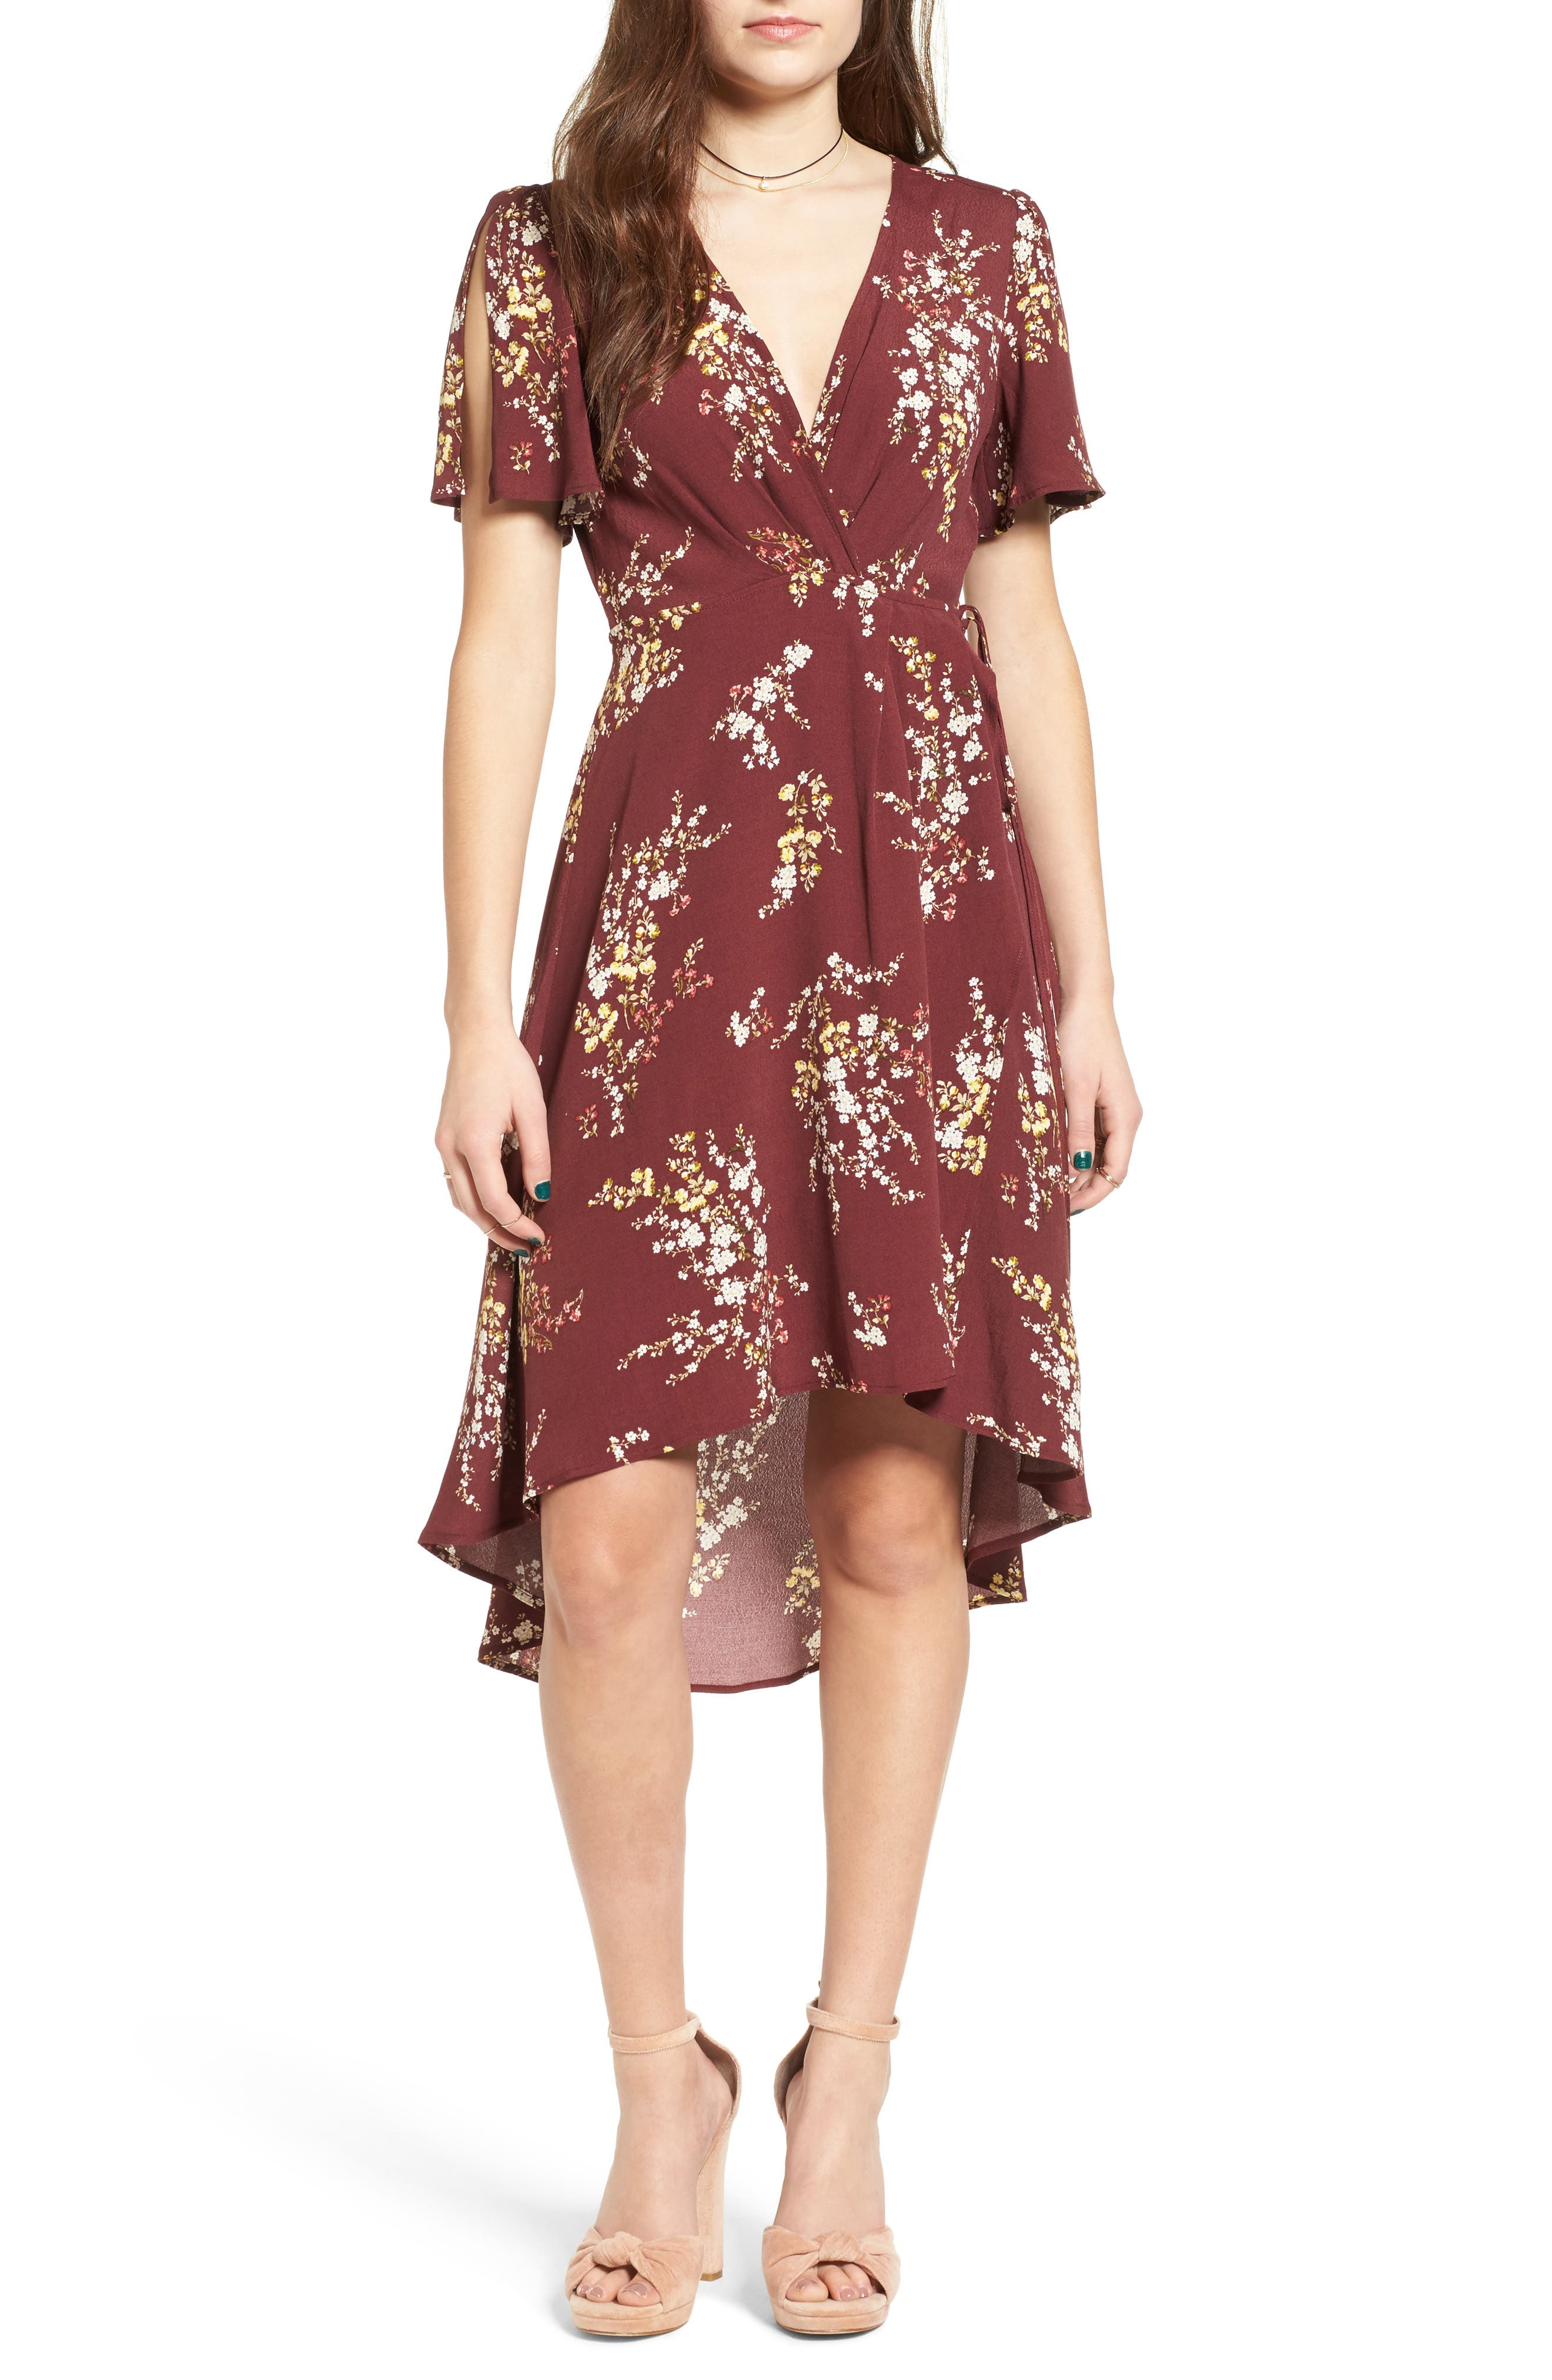 Main Image - ASTR the Label Adeline Floral Print Wrap Dress